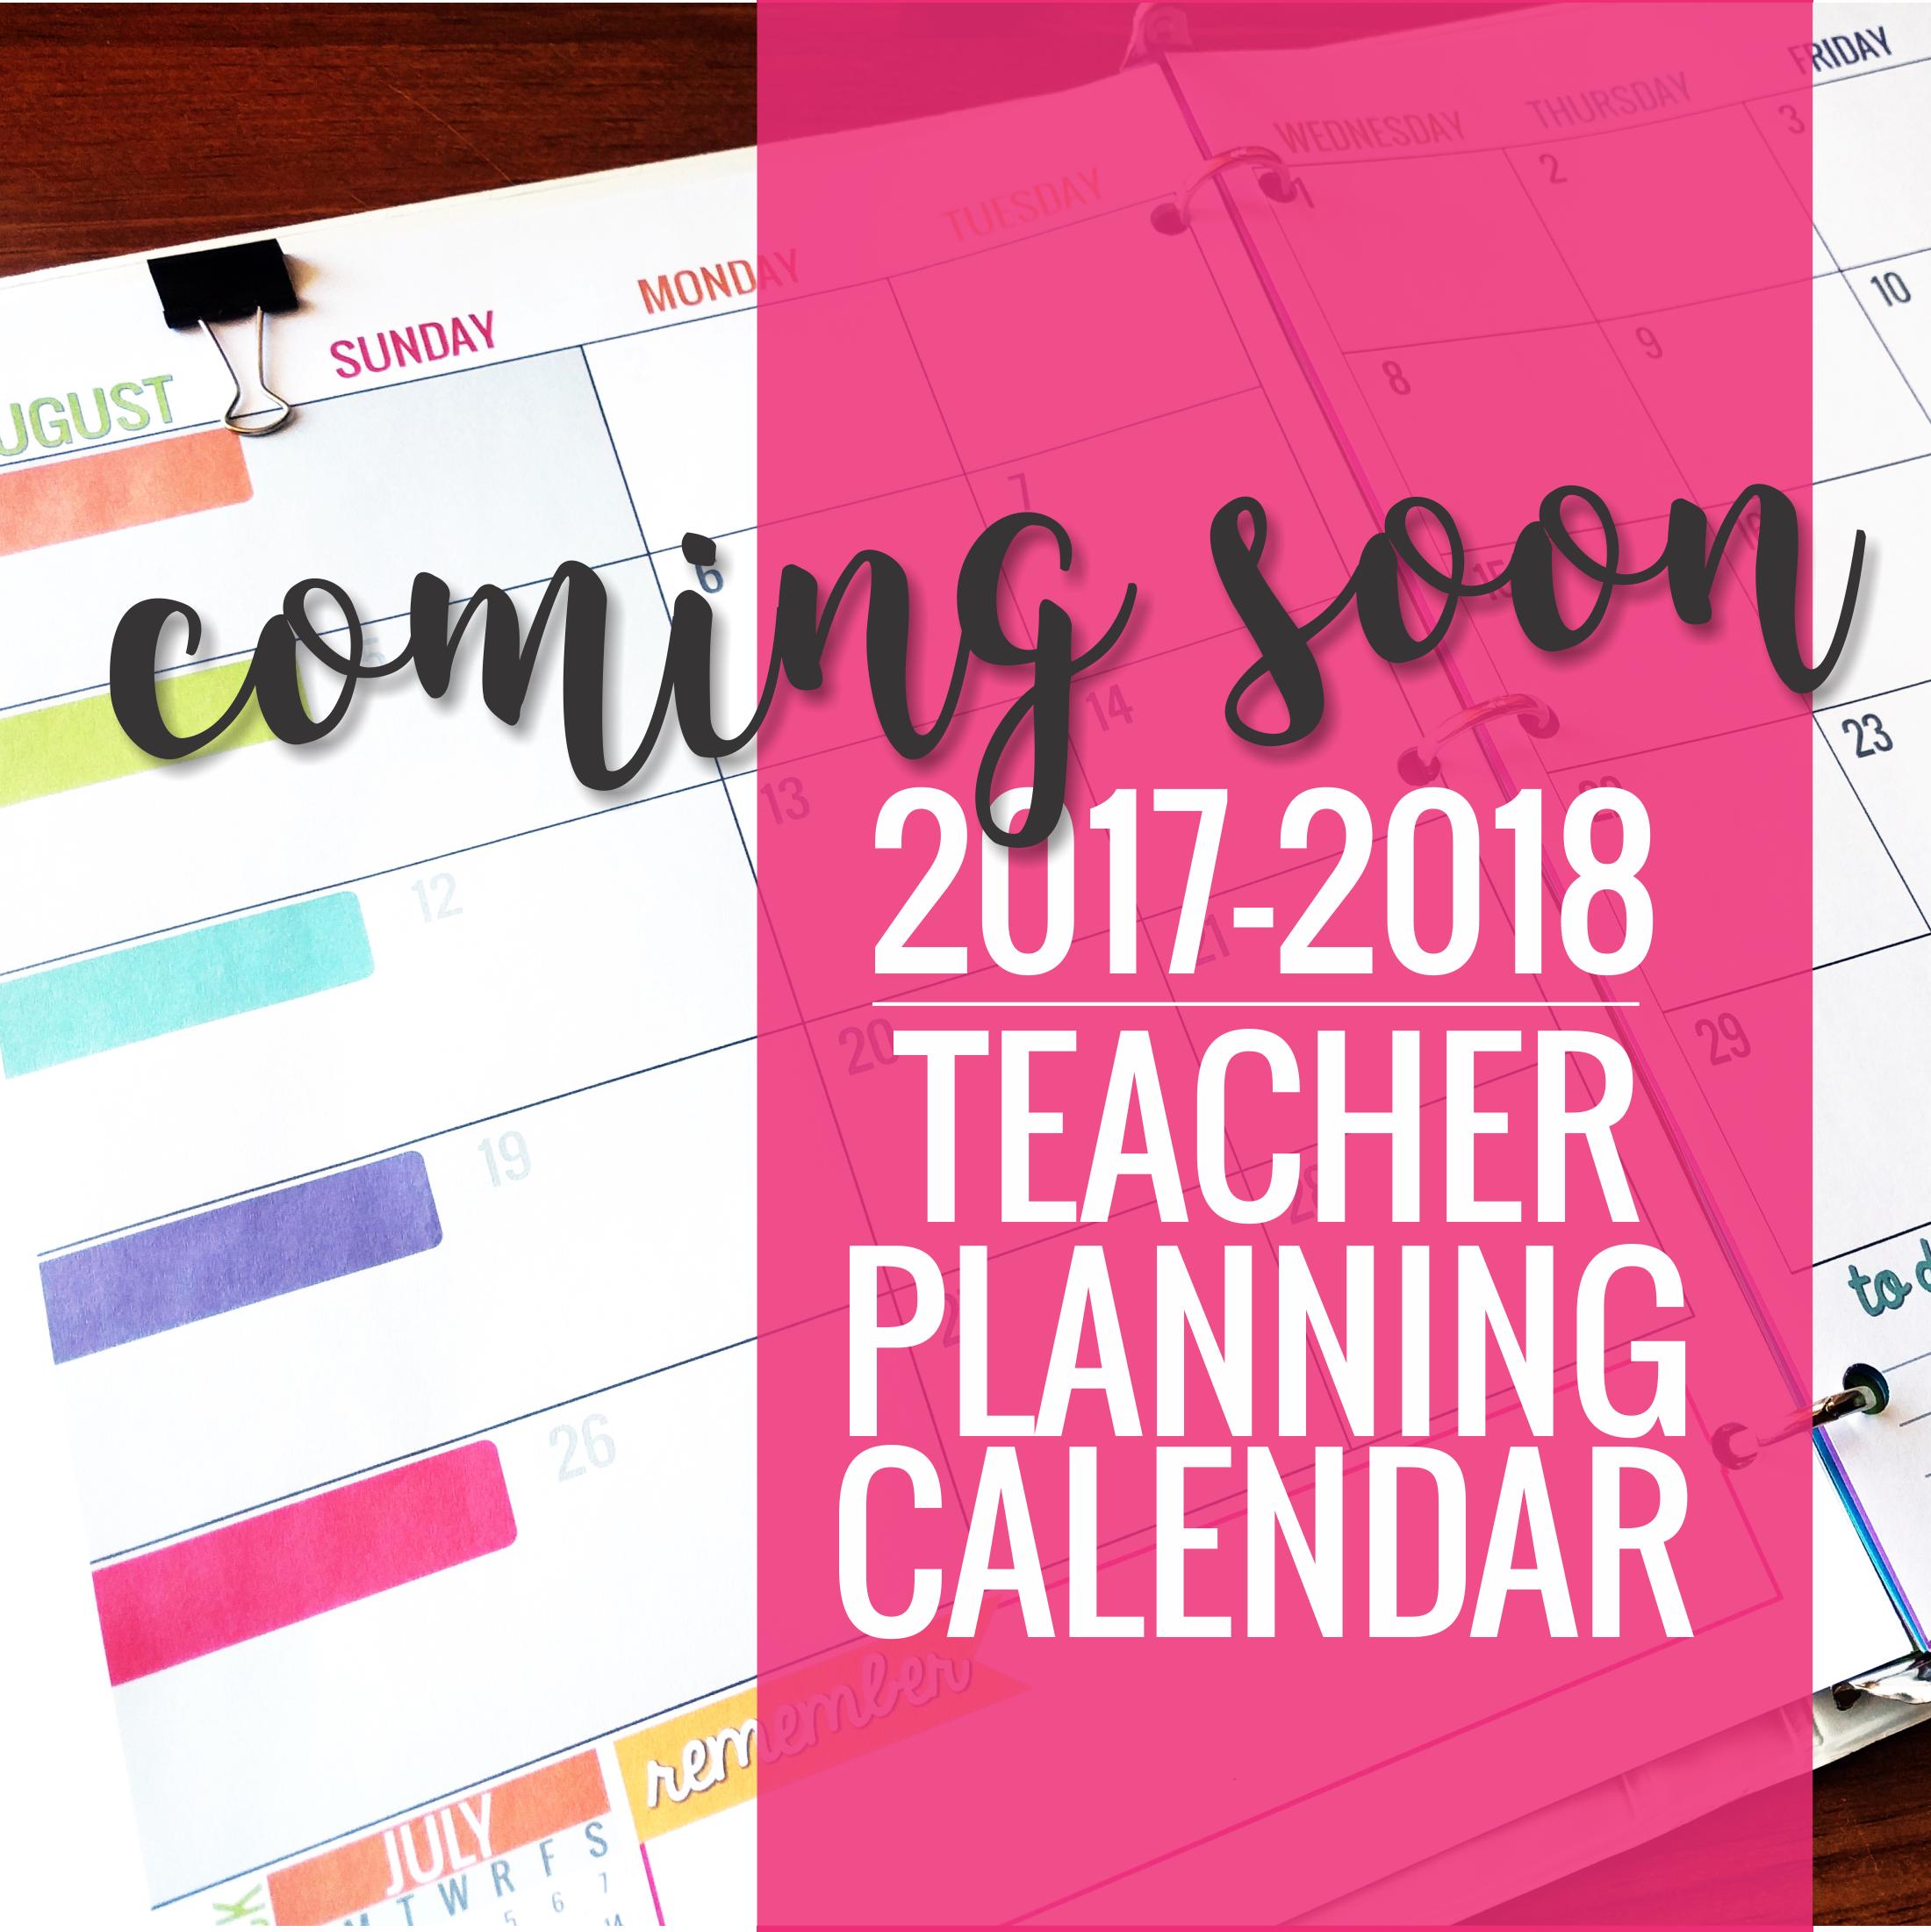 Printable 20172018 Teacher Planning Calendar Template – Teacher Calendar Template